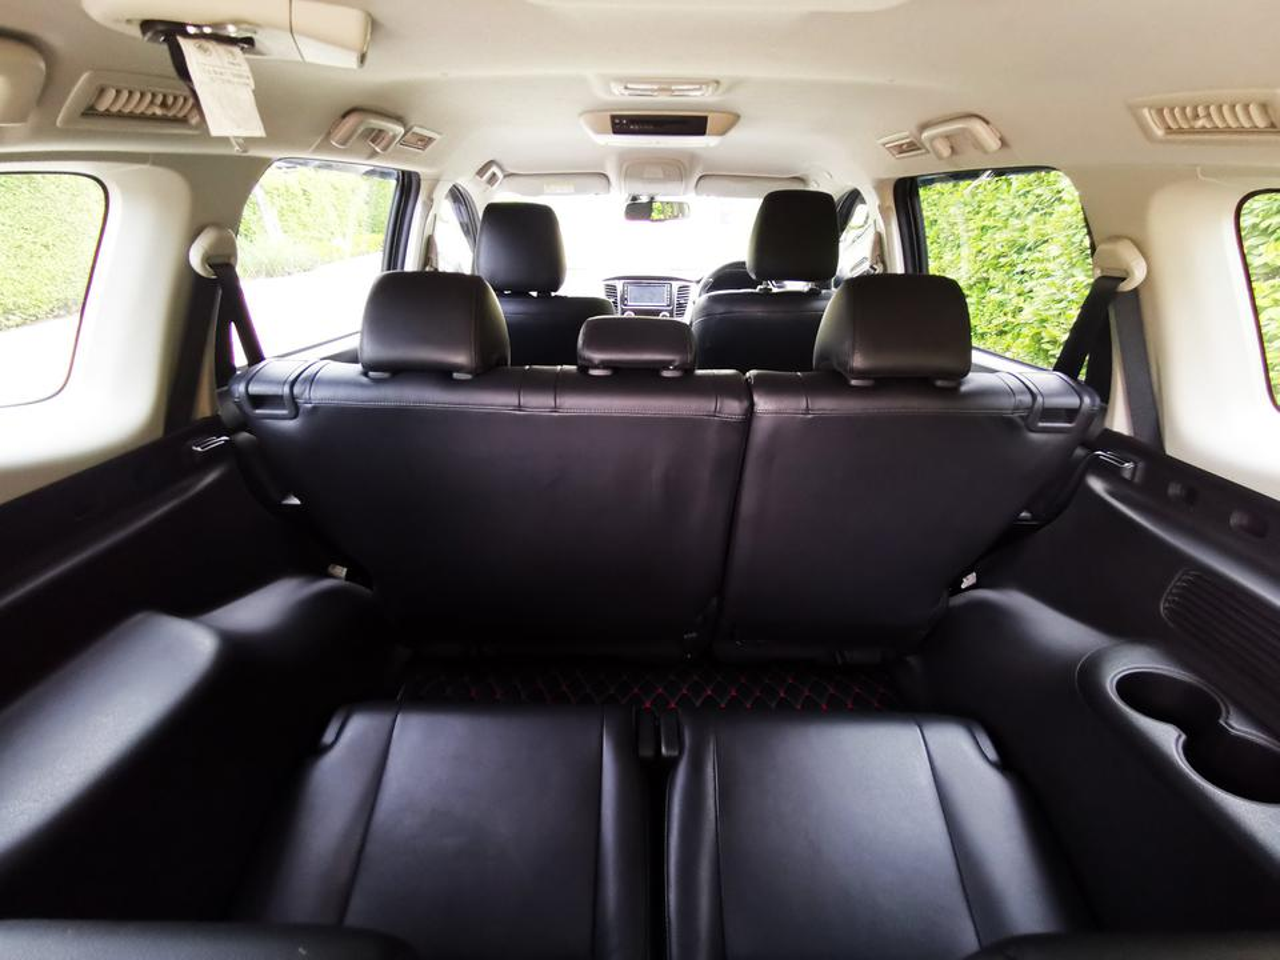 Mitsubishi Pajero Sport 2.4 GT Premium (ปี 2018) SUV AT รูปที่ 5